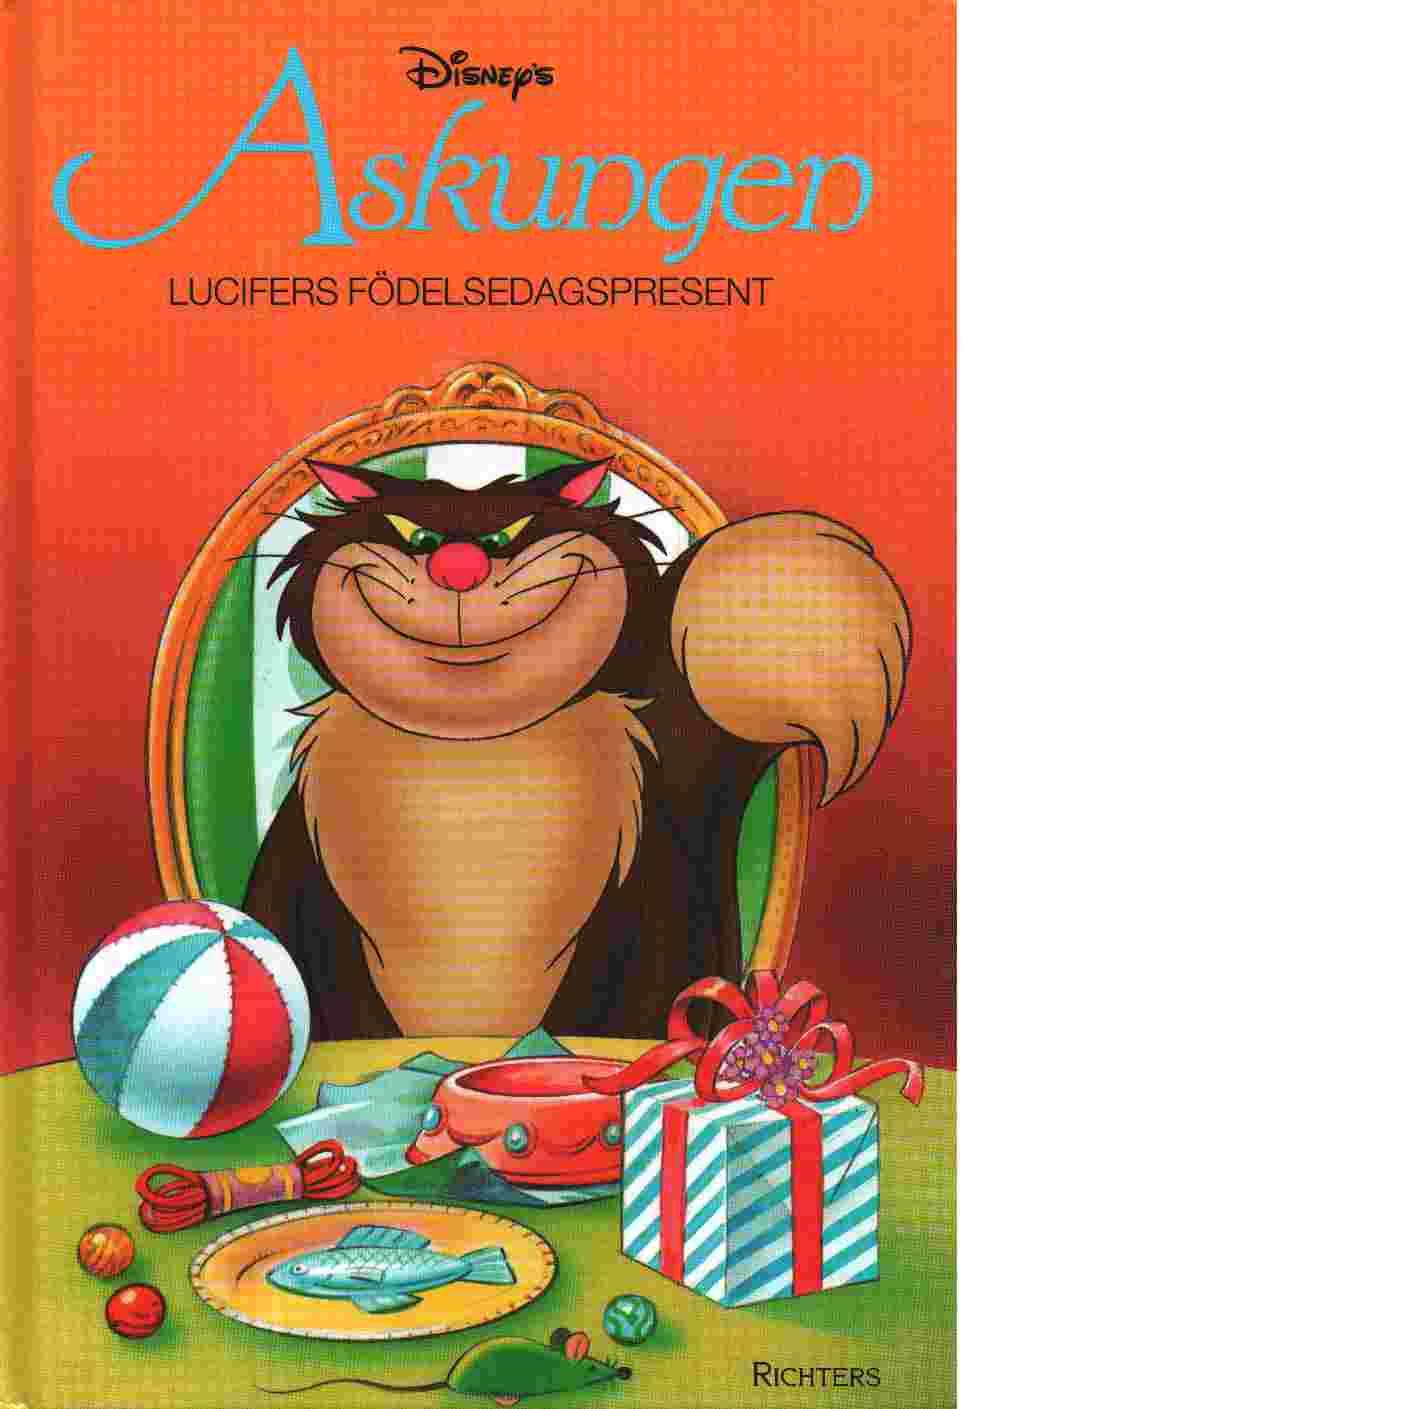 Askungen  Lucifers födelsedagspresent - Walt Disney Company